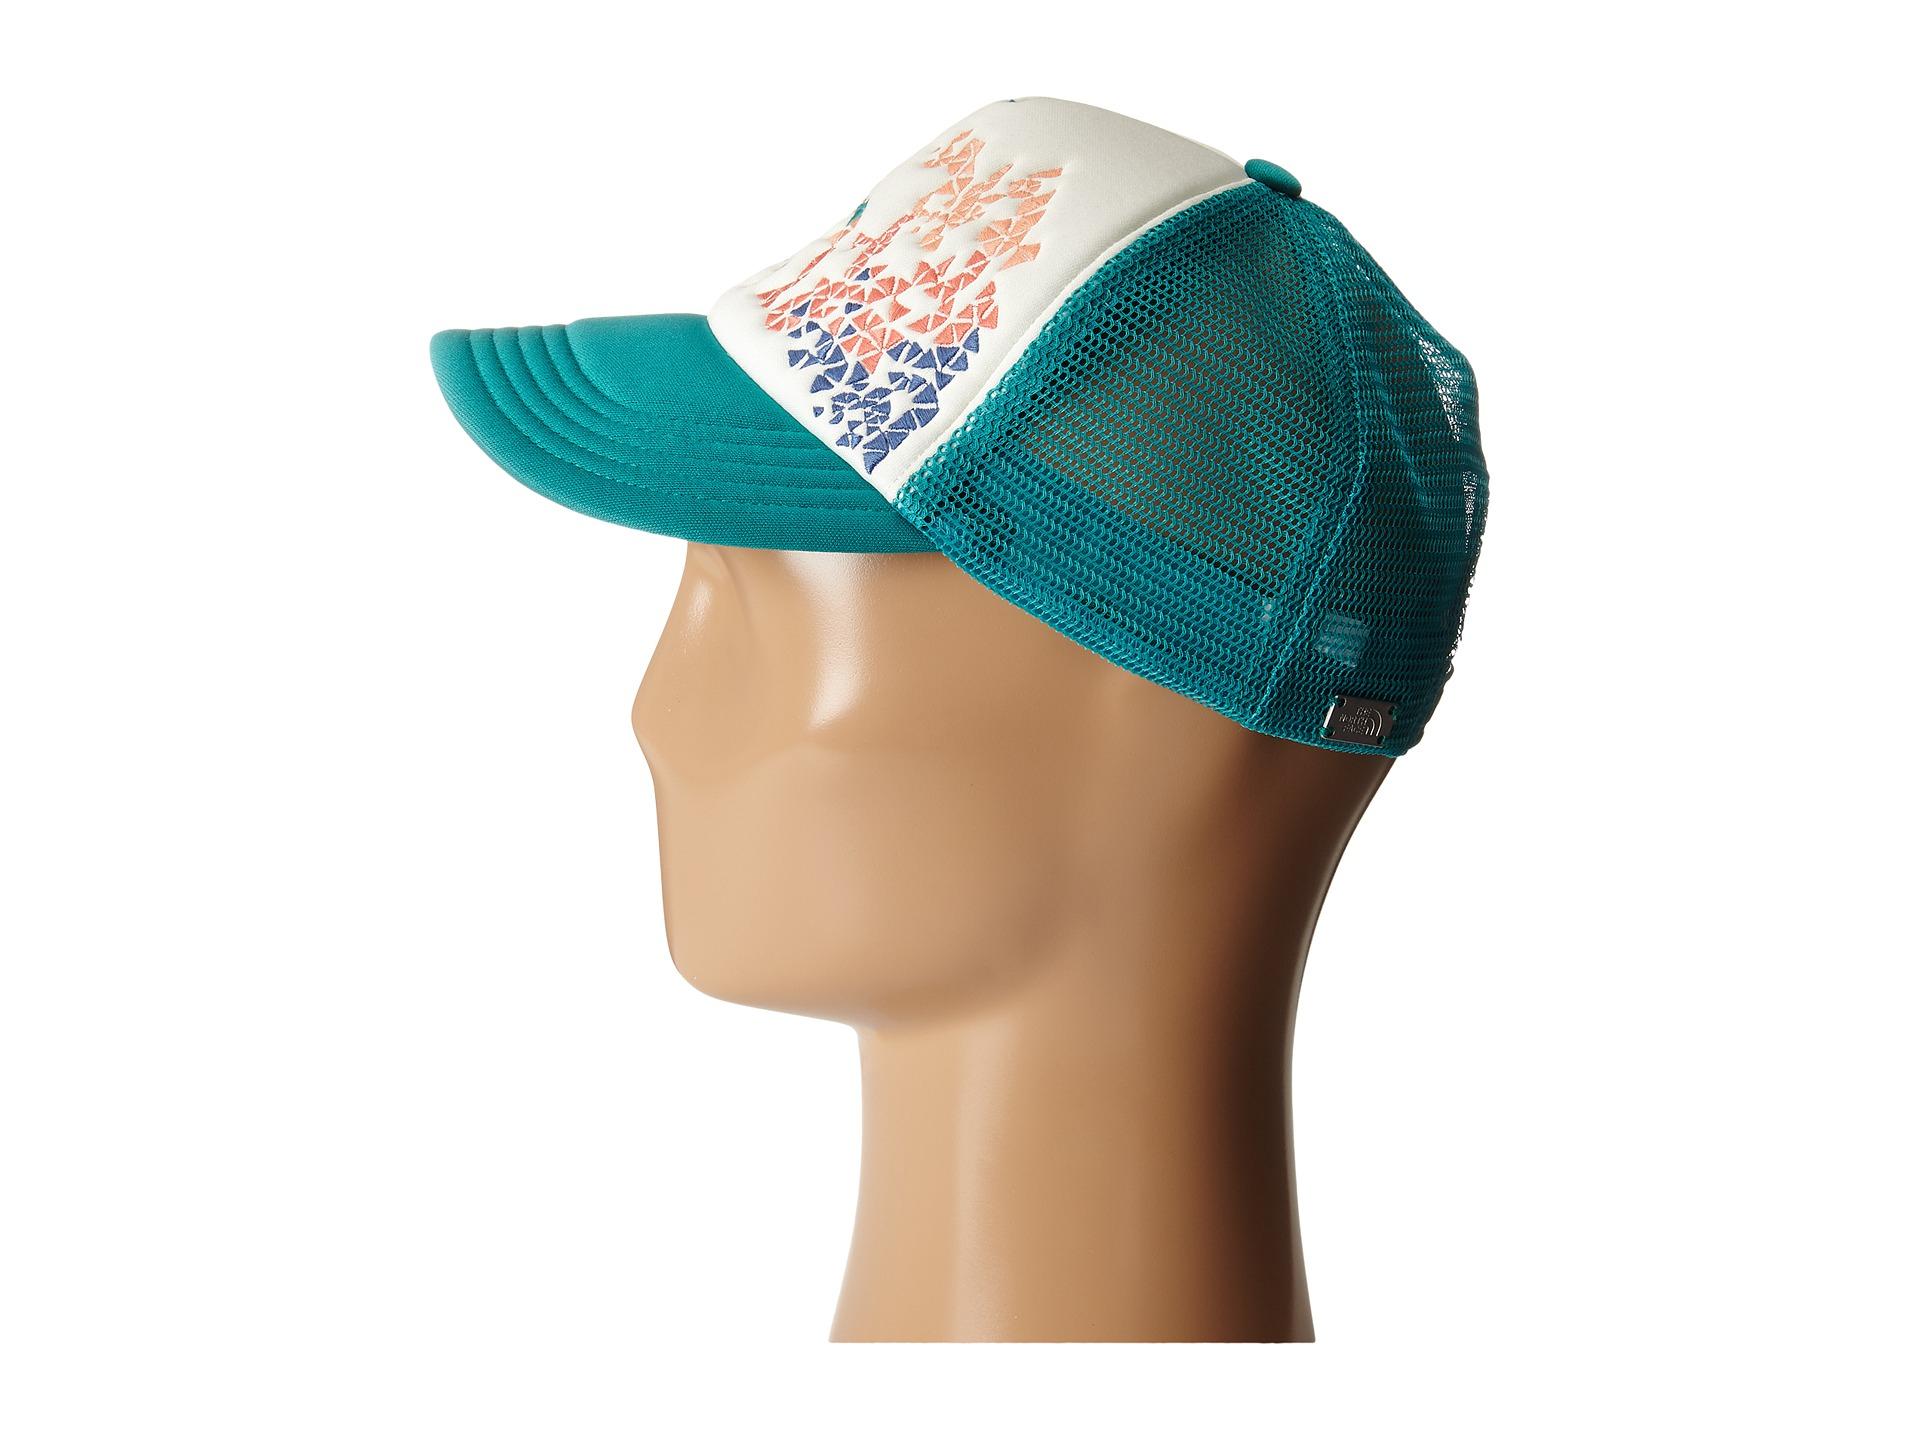 54cb49578cbbd germany patrizia pepe chunky knitted baker boy hat pattern 615e5 e4420